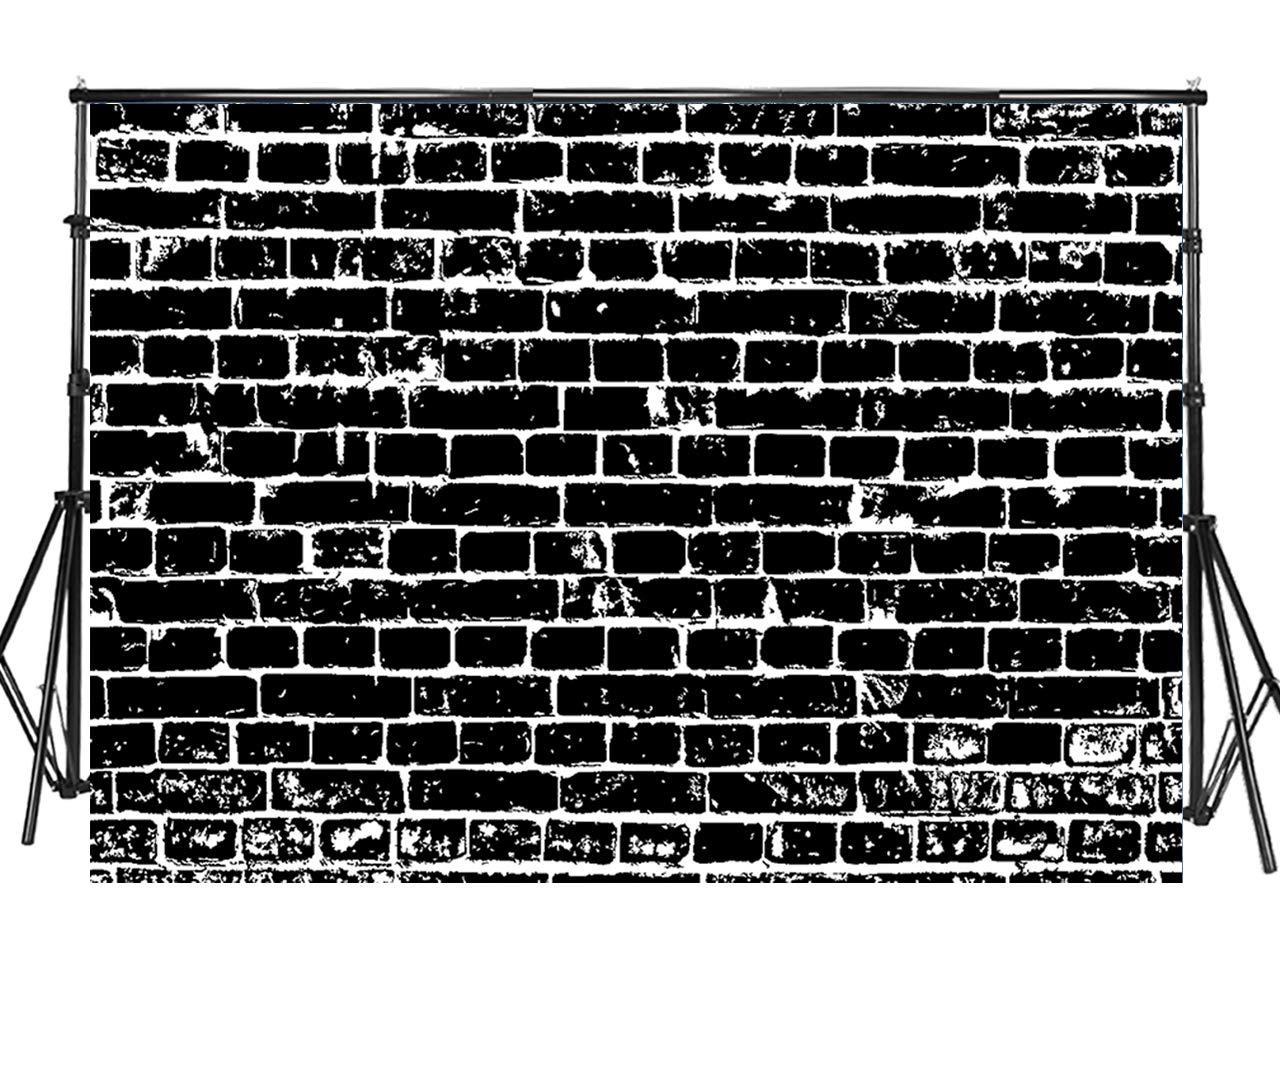 Sensfun レンガ 壁 写真 背景 ビンテージ レンガ 床 壁 写真 背景 結婚式 ベビーシャワー 新生児 誕生日パーティー クリスマス ハロウィン ポートレート 写真ブース バナー 写真 スタジオ 小道具 7x5ft WP030 B07LD4KDZ3